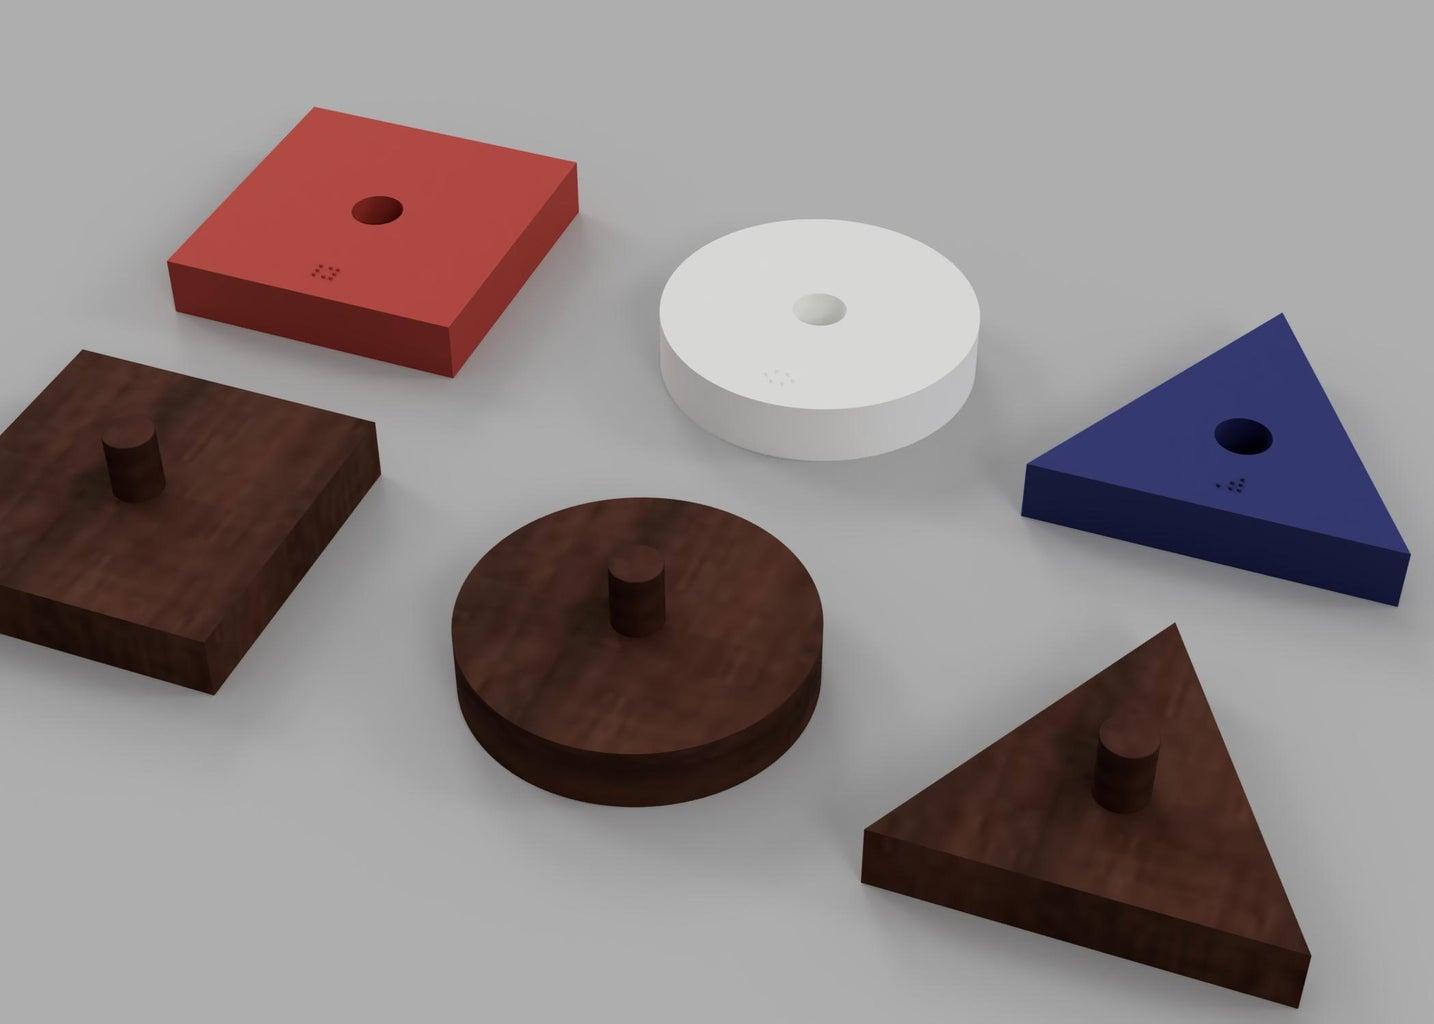 Learn Geometric Figures for Blind Children - Braille